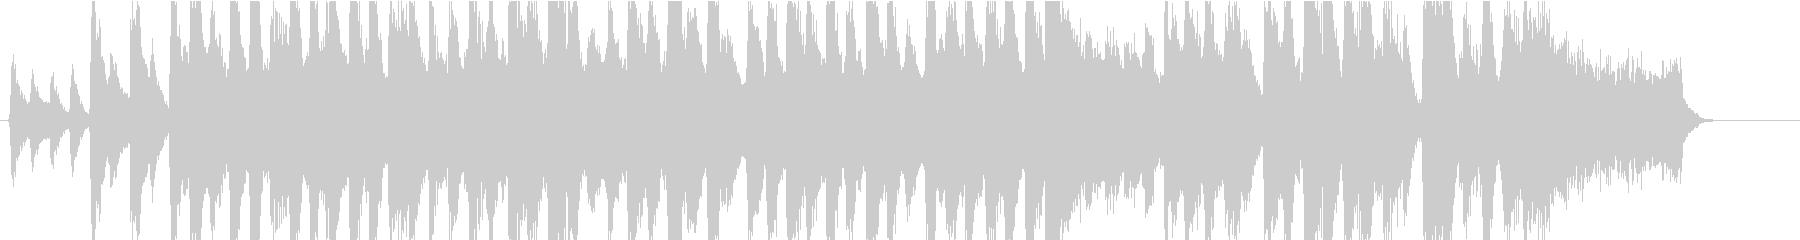 CMサイズ クリスマス・ソングですの未再生の波形